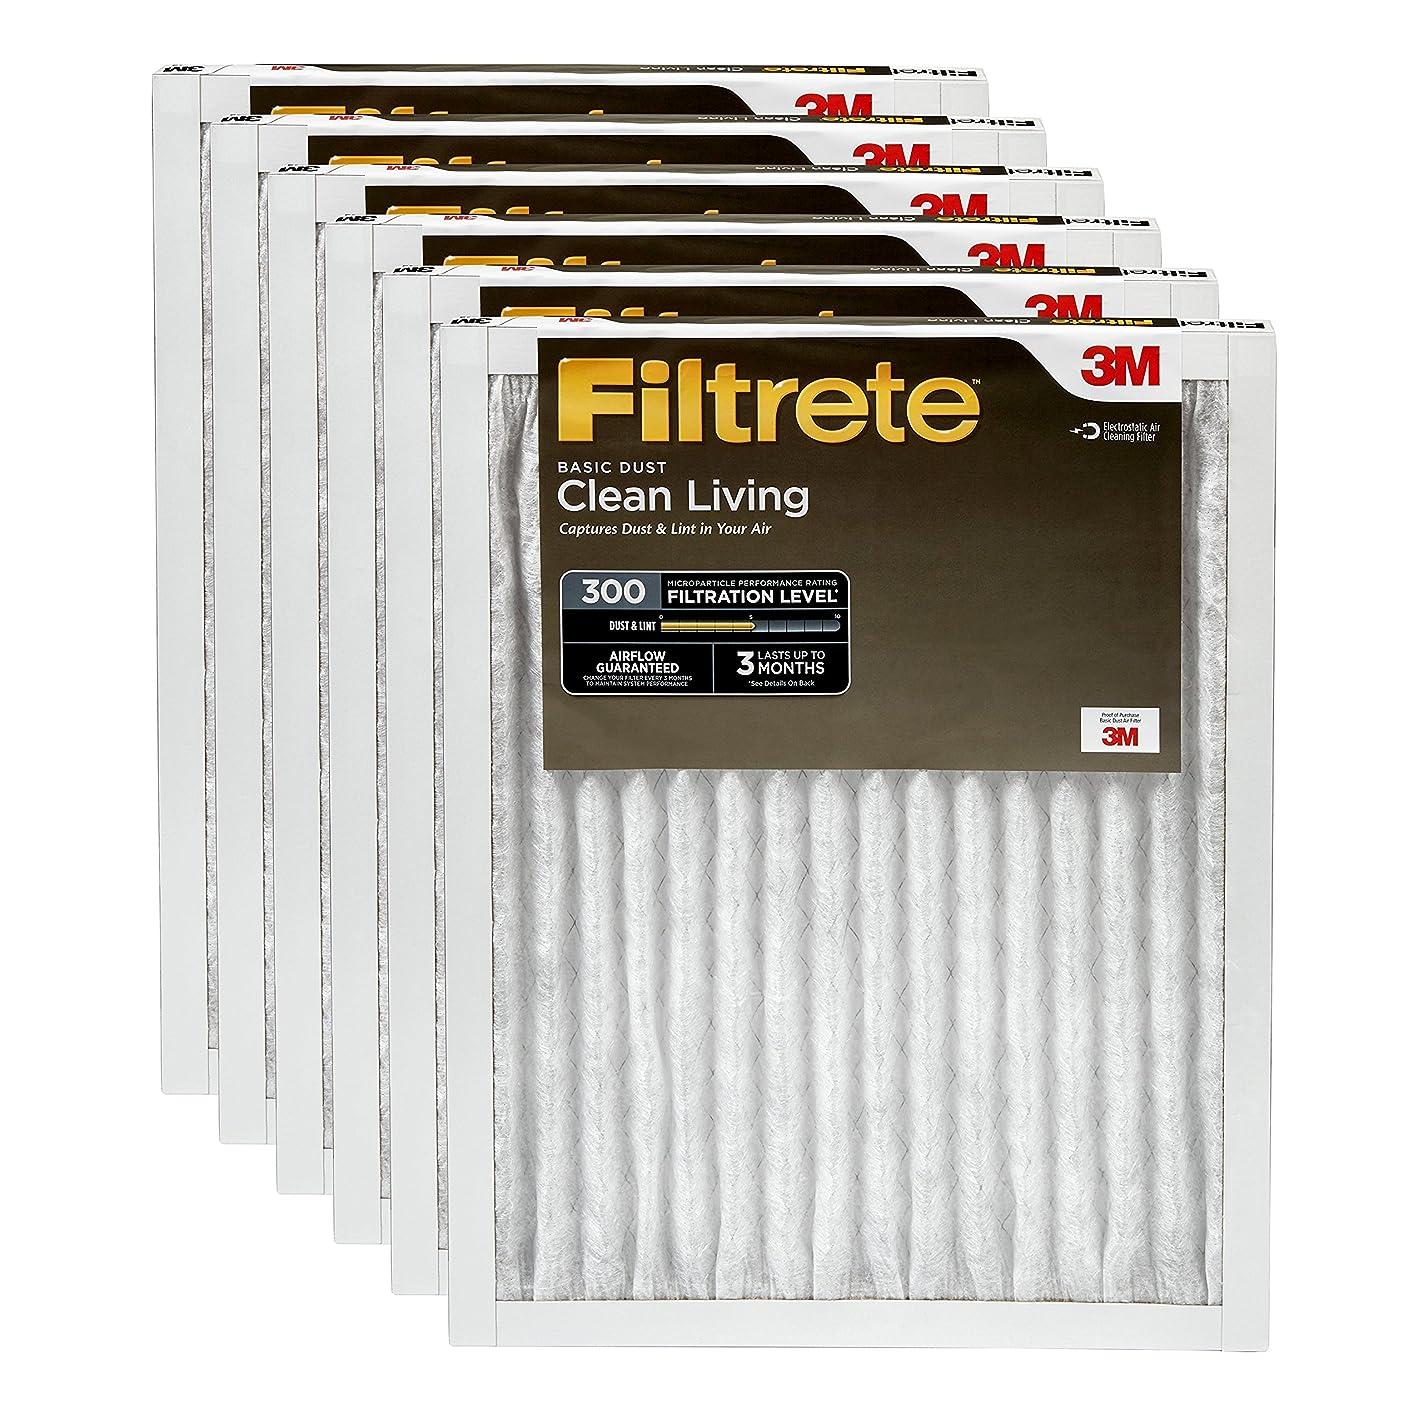 Filtrete 16x25x1, AC Furnace Air Filter, MPR 300, Clean Living Basic Dust, 6-Pack